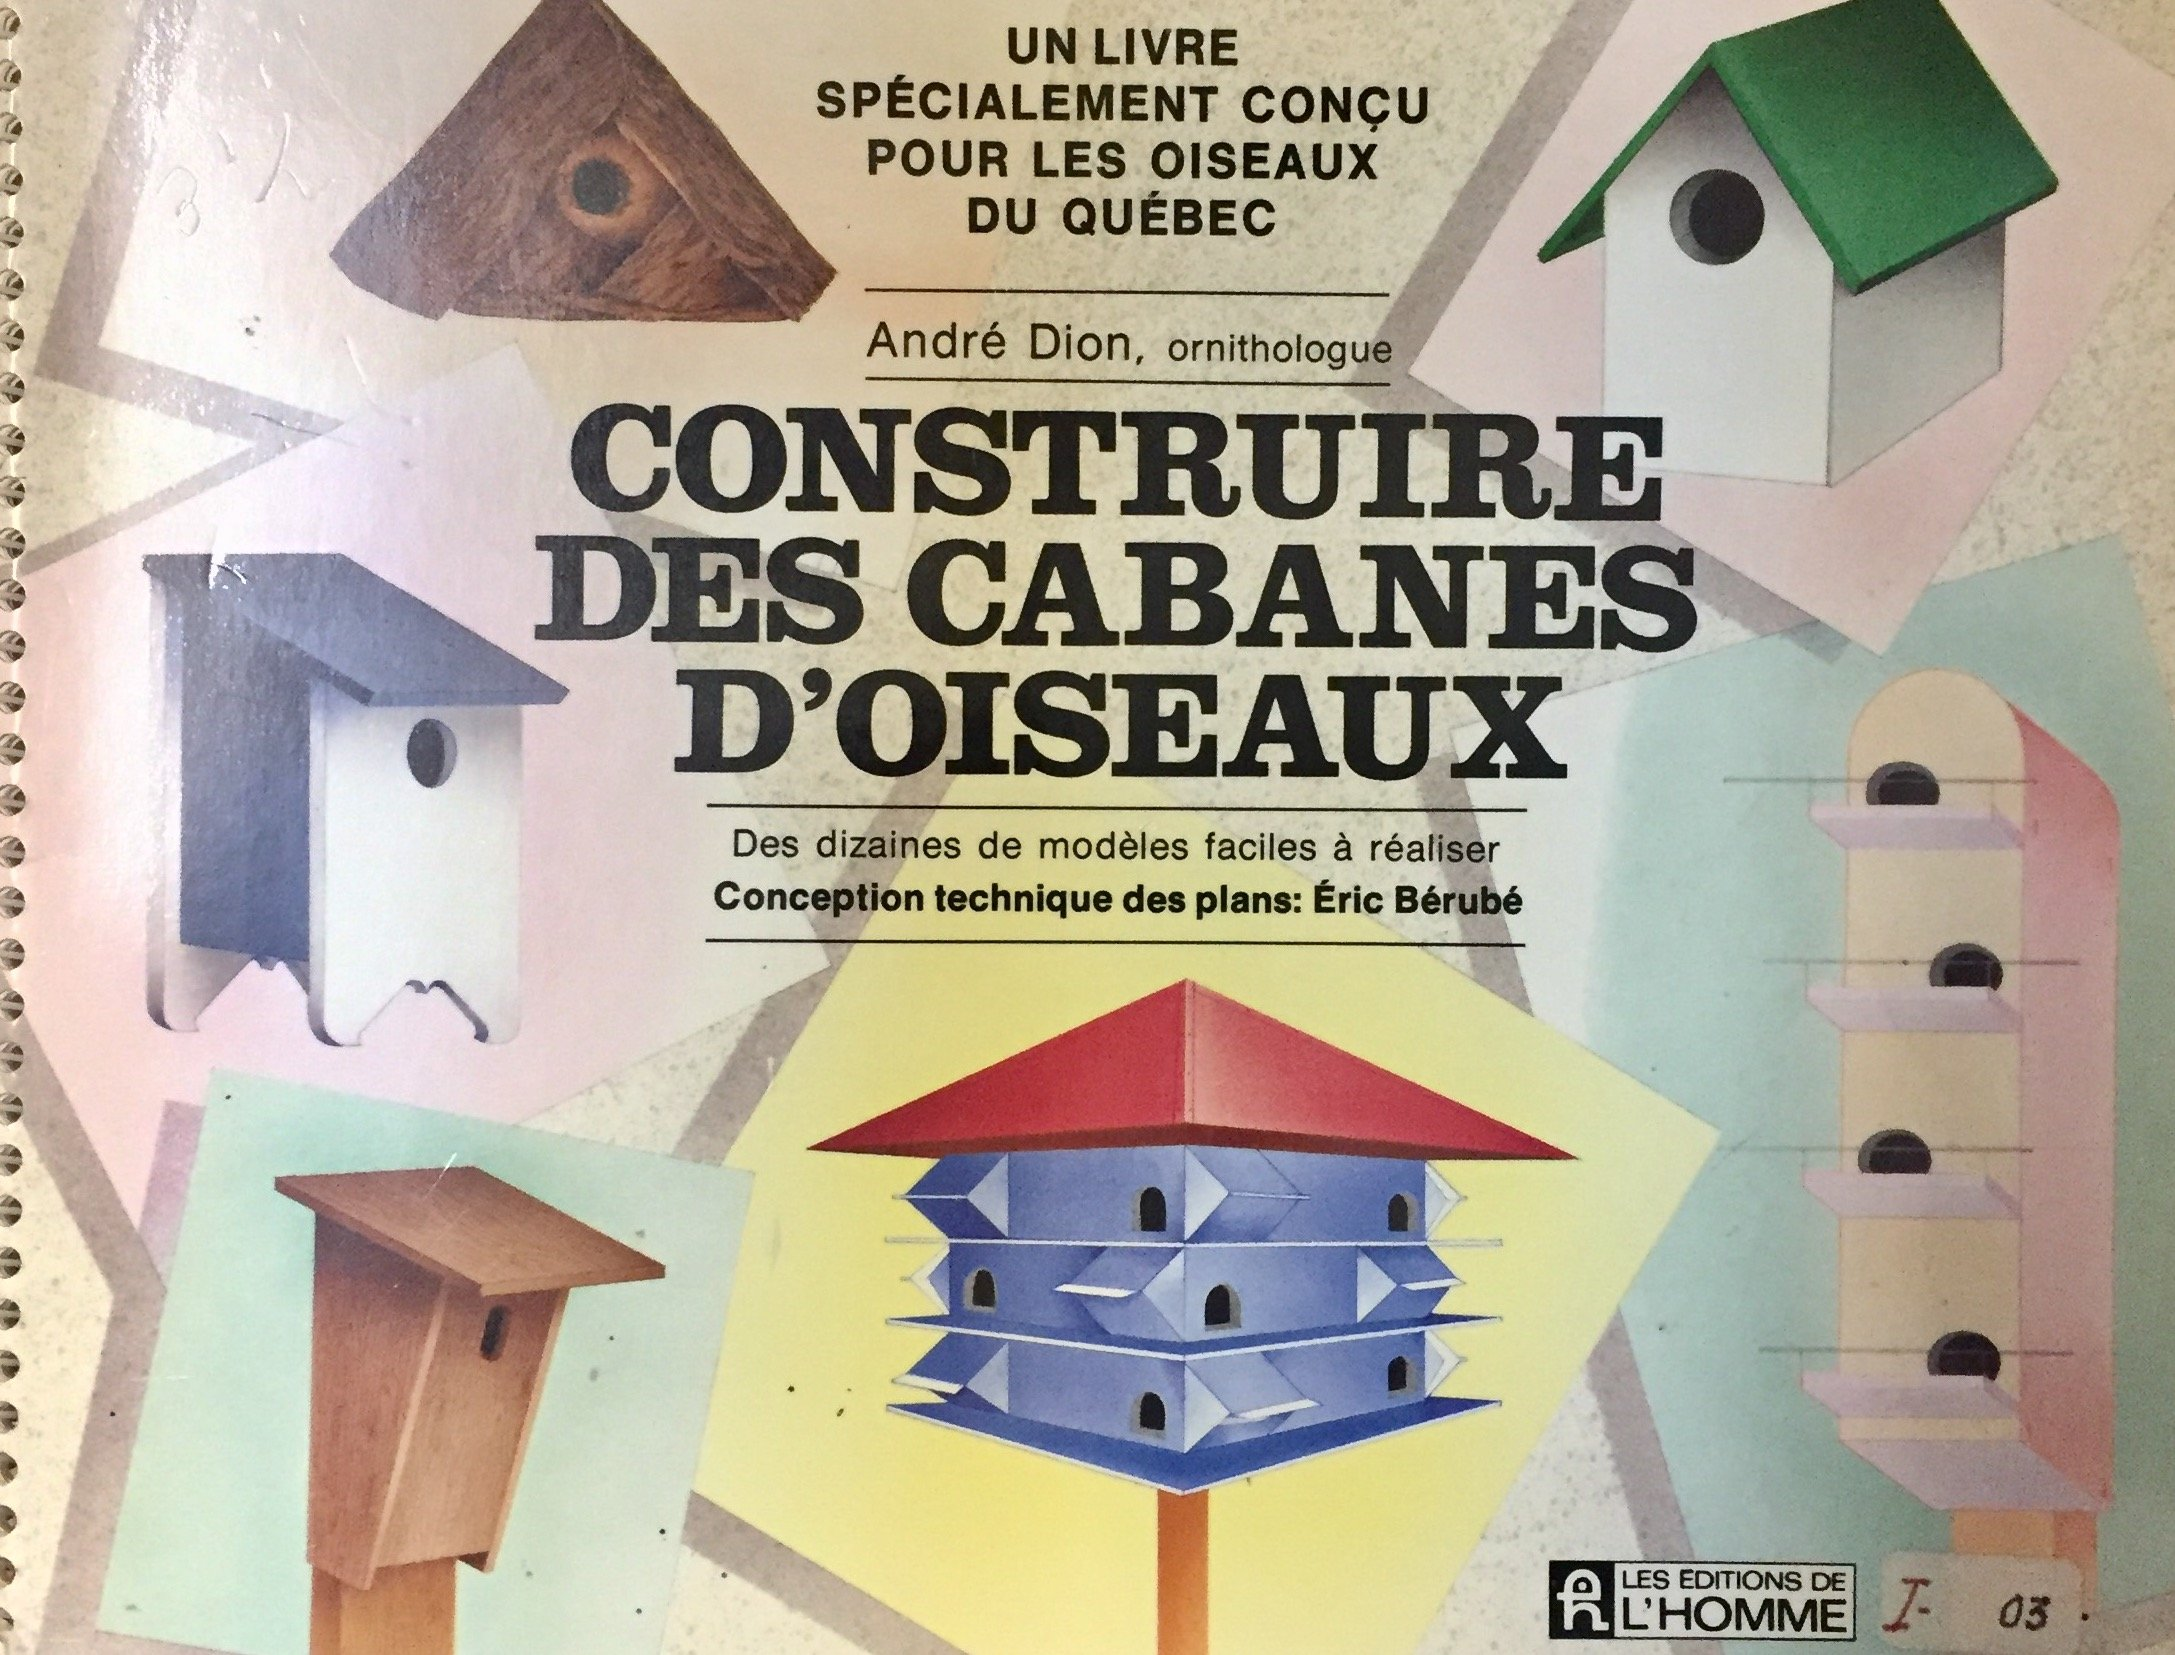 Construire Des Cabanes D Oisea French Edition Dion Andre 9782761905749 Amazon Com Books